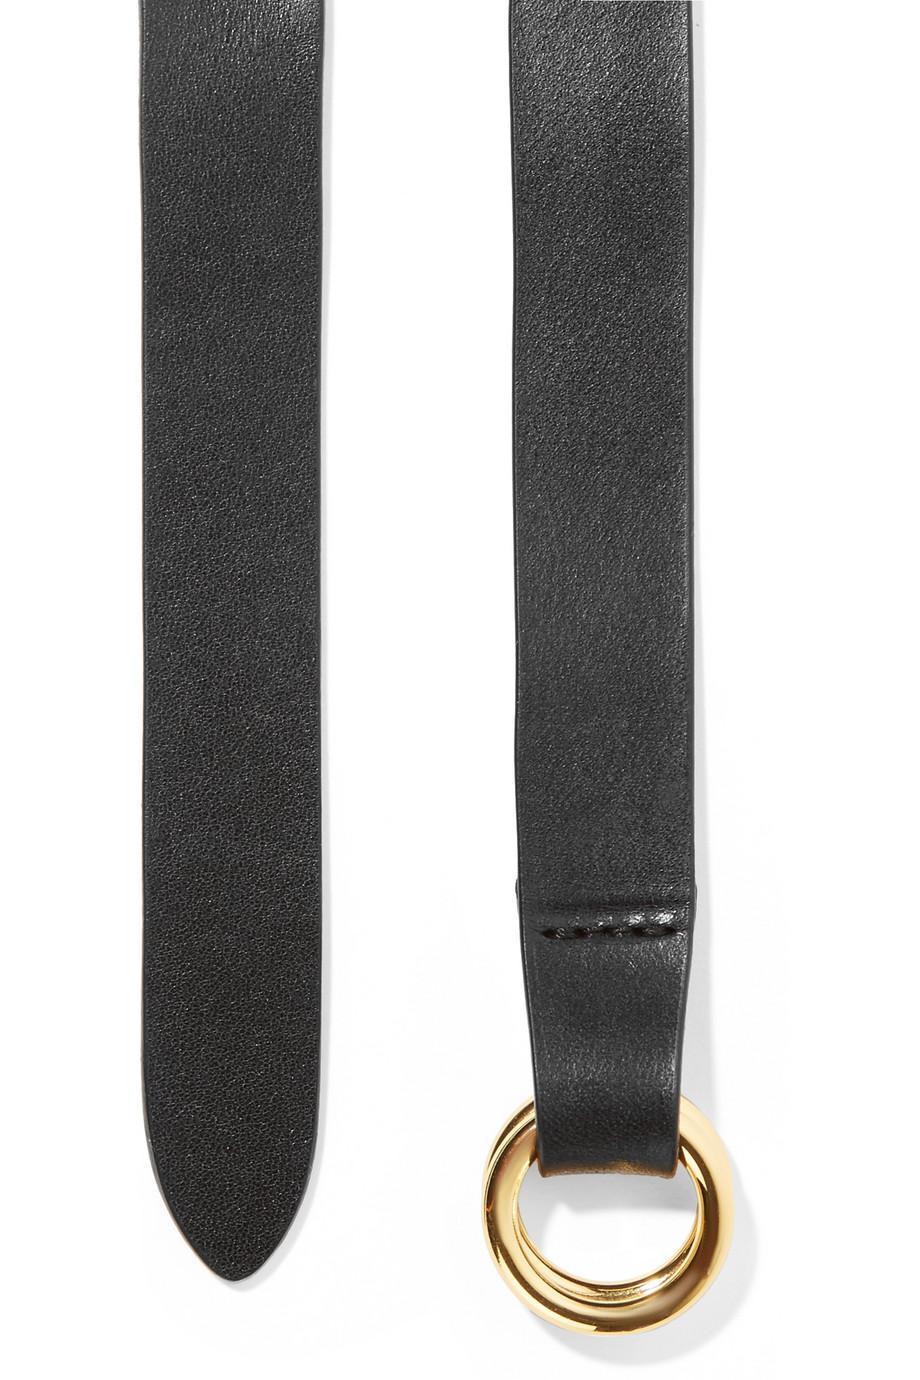 Cajou Studded Leather Waist Belt - Black Isabel Marant dLSBM